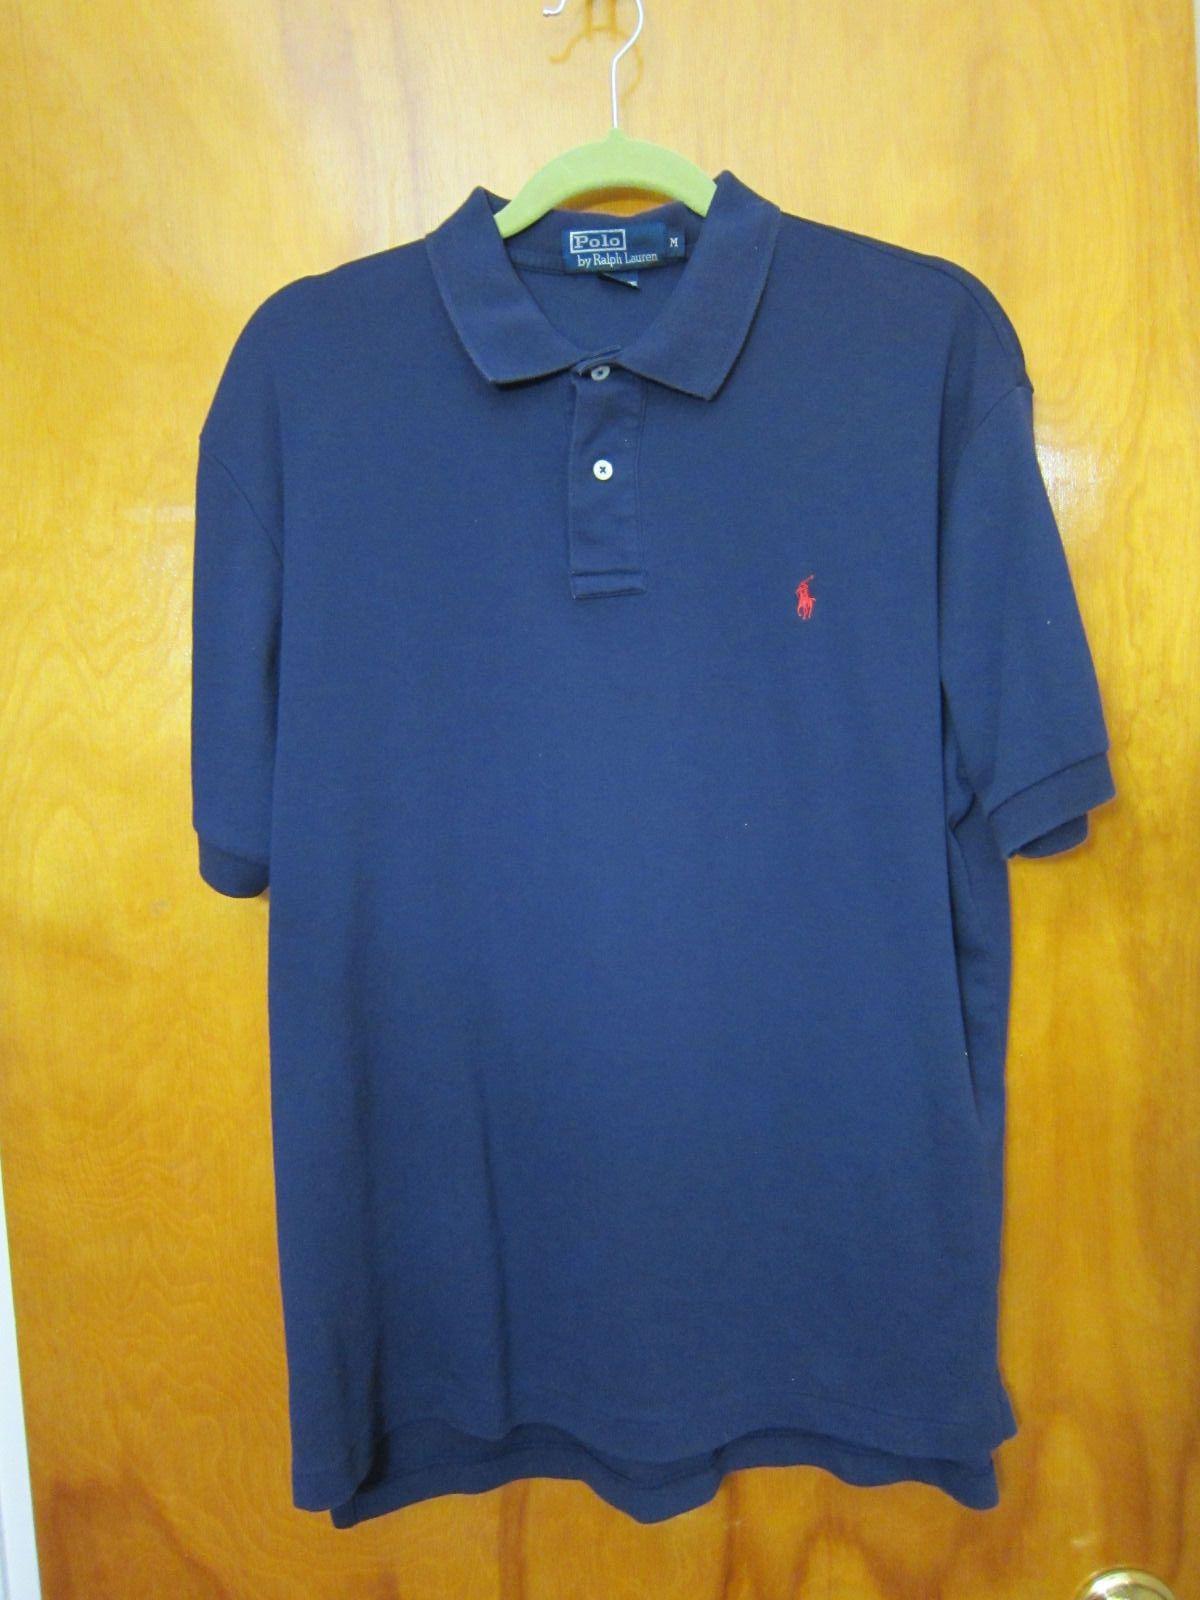 95056d4df Polo by Ralph Lauren Navy Blue Short Sleeve Polo Shirt Mens Size Medium M